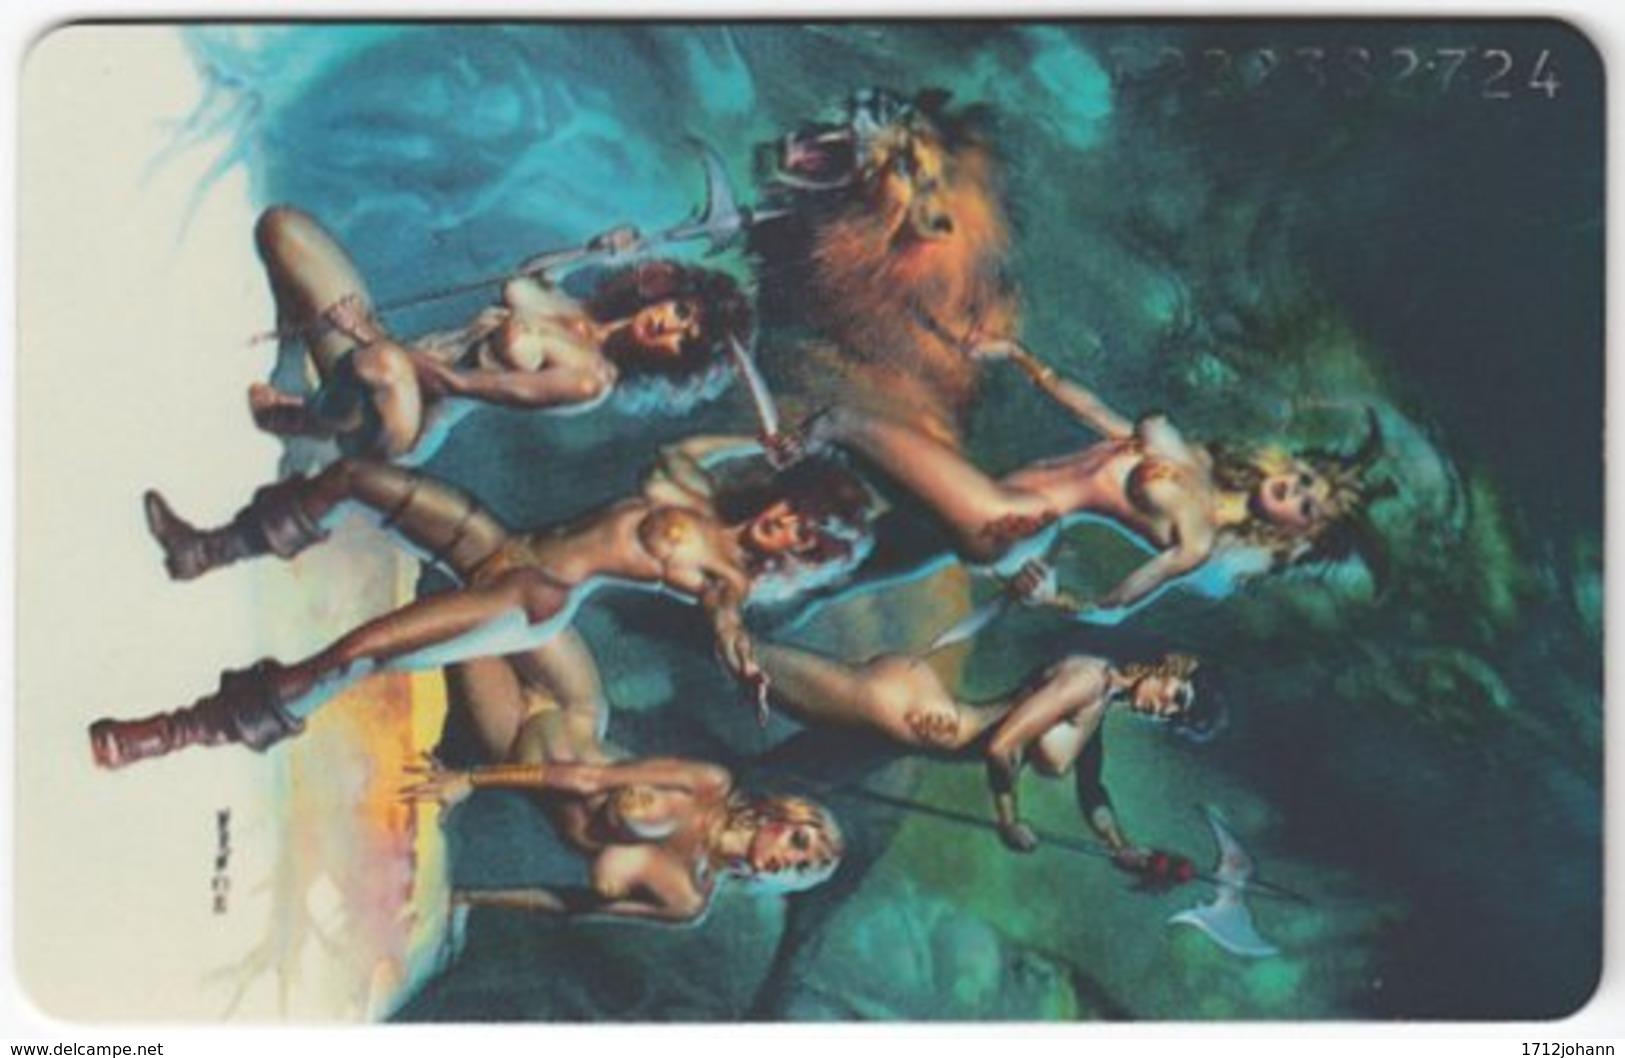 GERMANY K-Serie A-561 - 772 02.93 - Painting, Phantasy - MINT - Deutschland